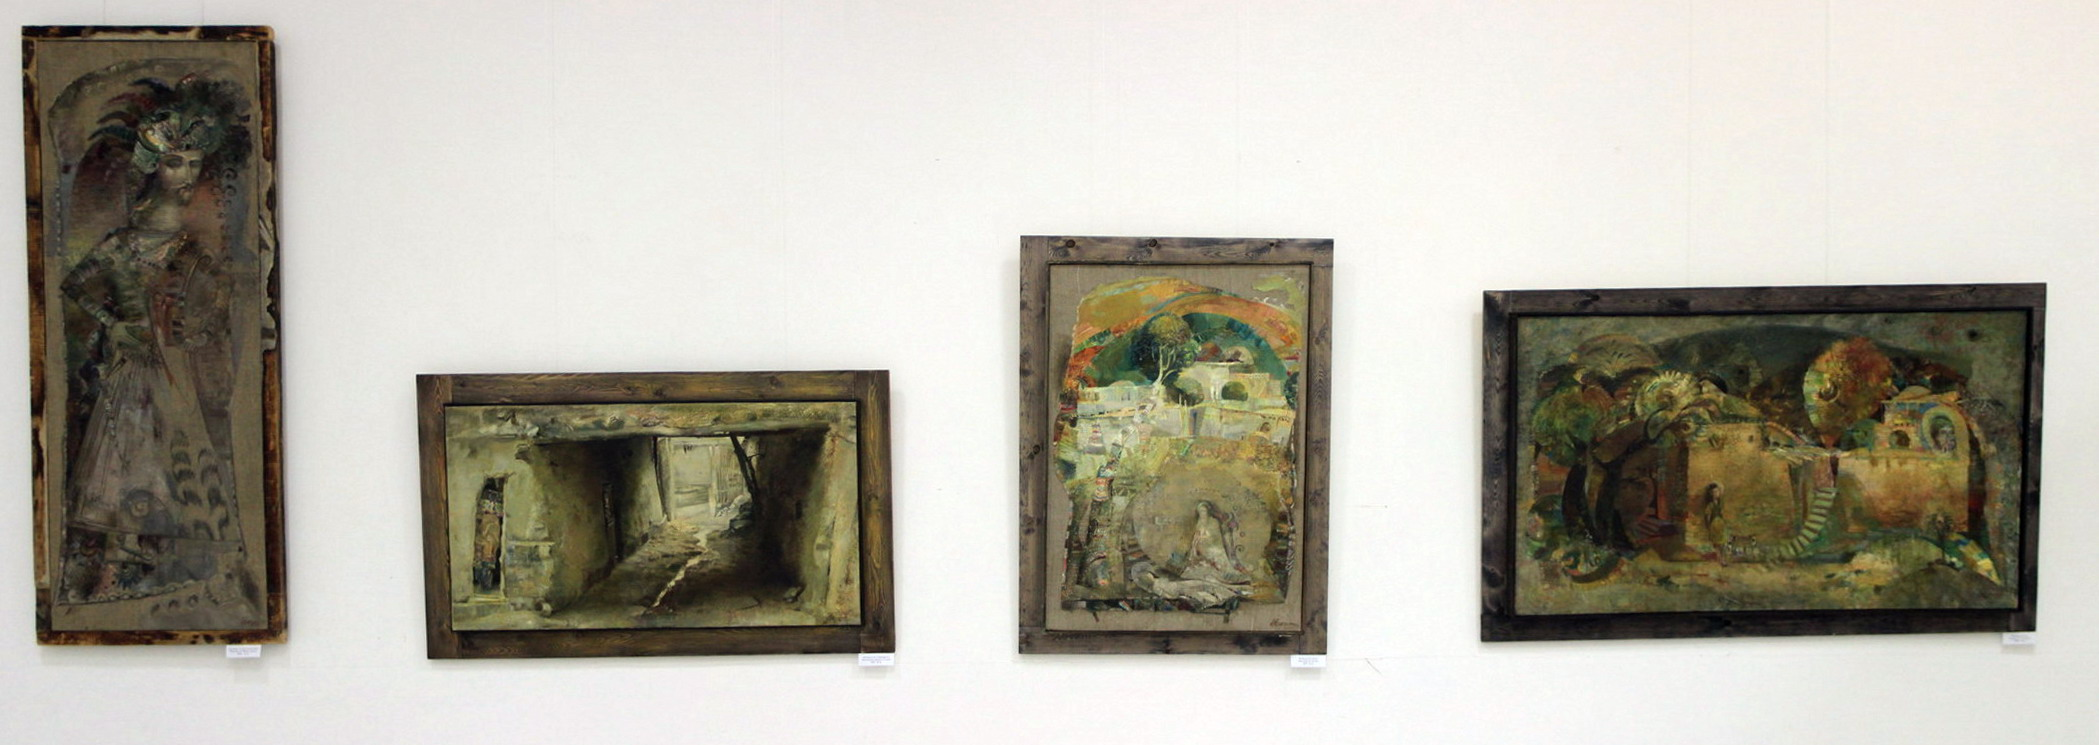 Экспозиция картин Б. Махкамова